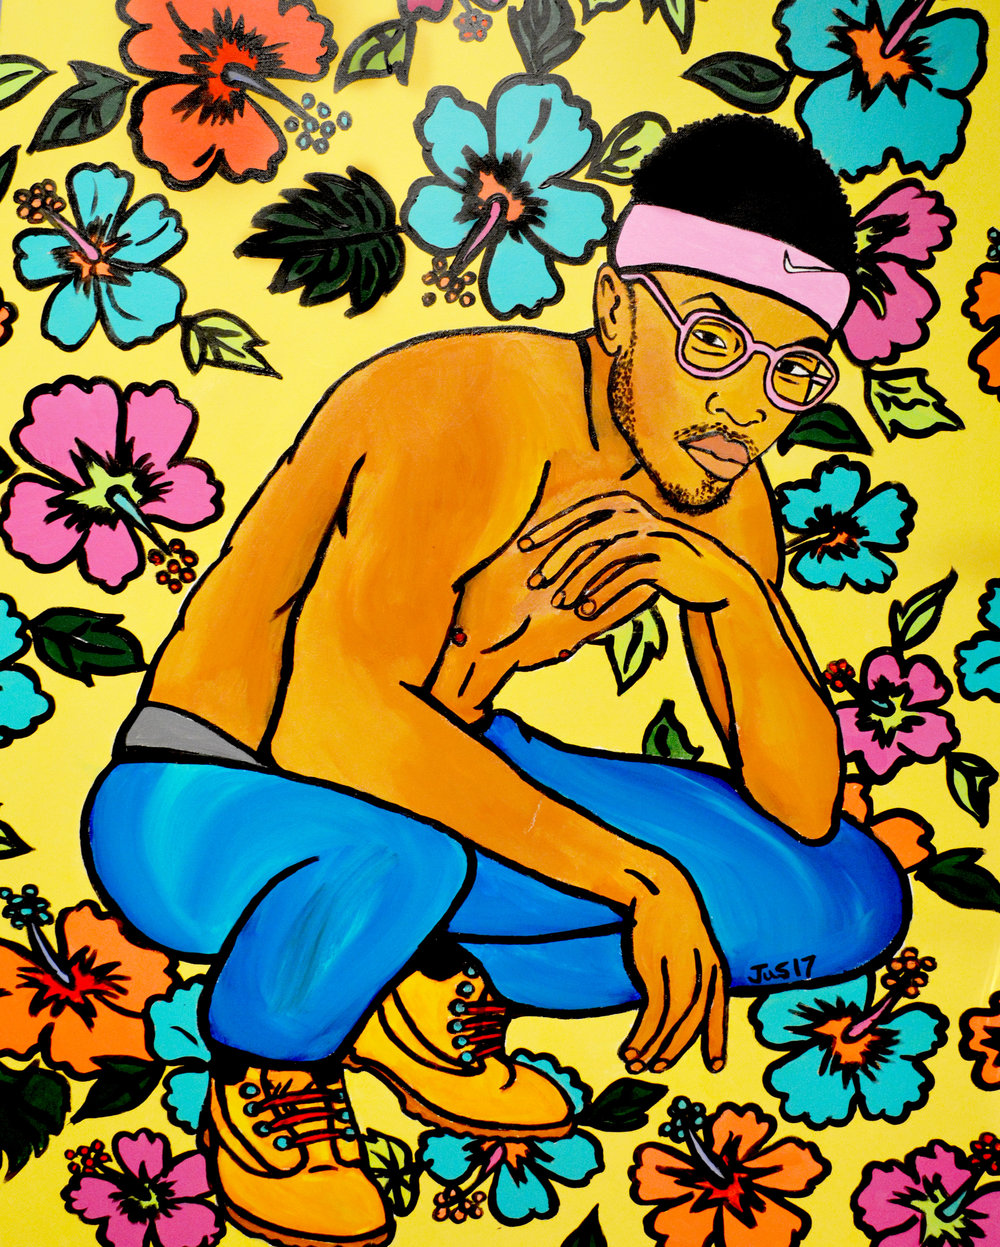 man squatting.jpg